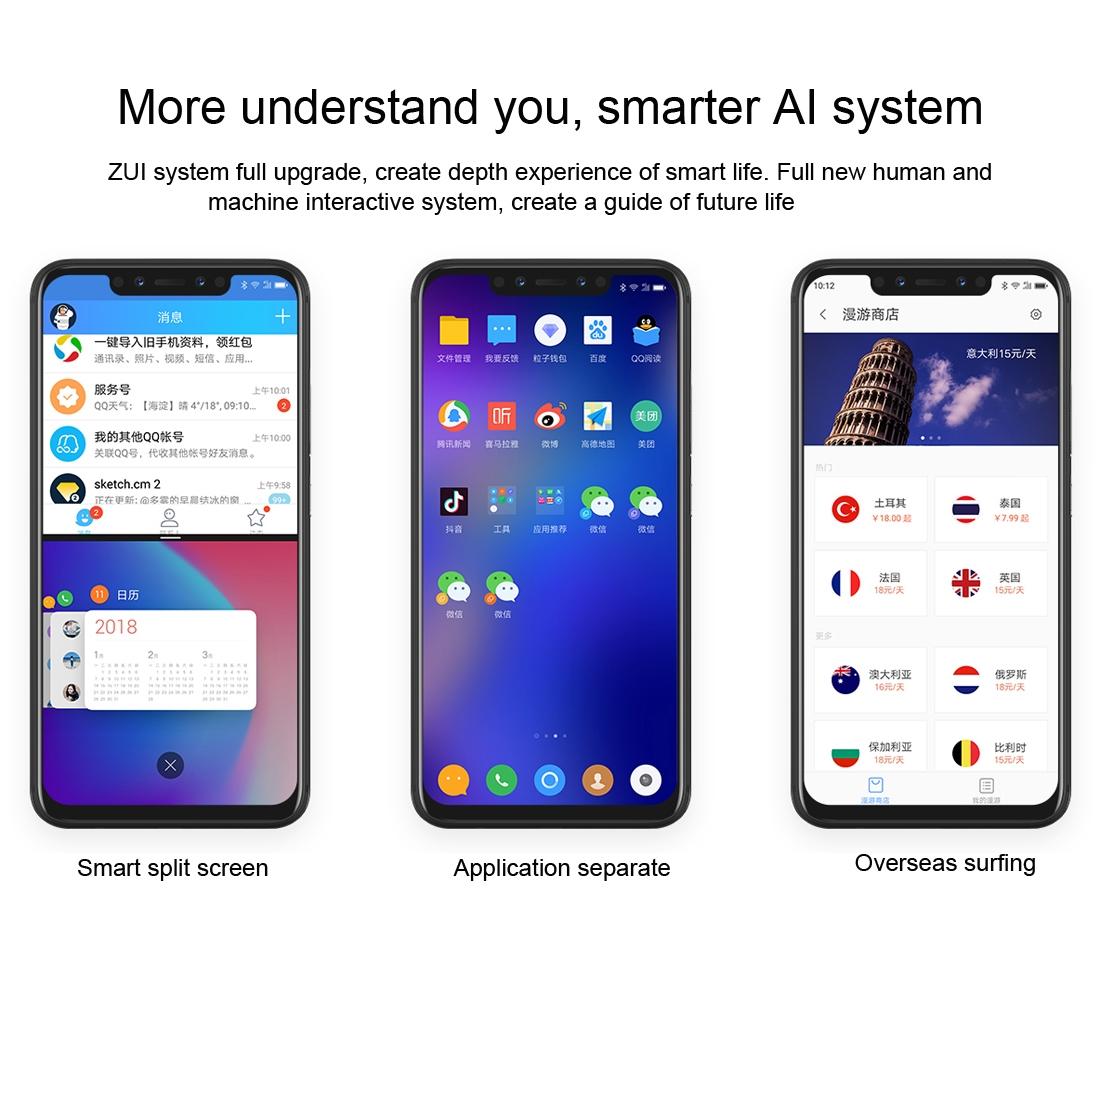 i.ibb.co/1rmKGjM/Smartphone-Celular-6-GB-RAM-64-GB-ROM-Lenovo-S5-Pro-21.jpg